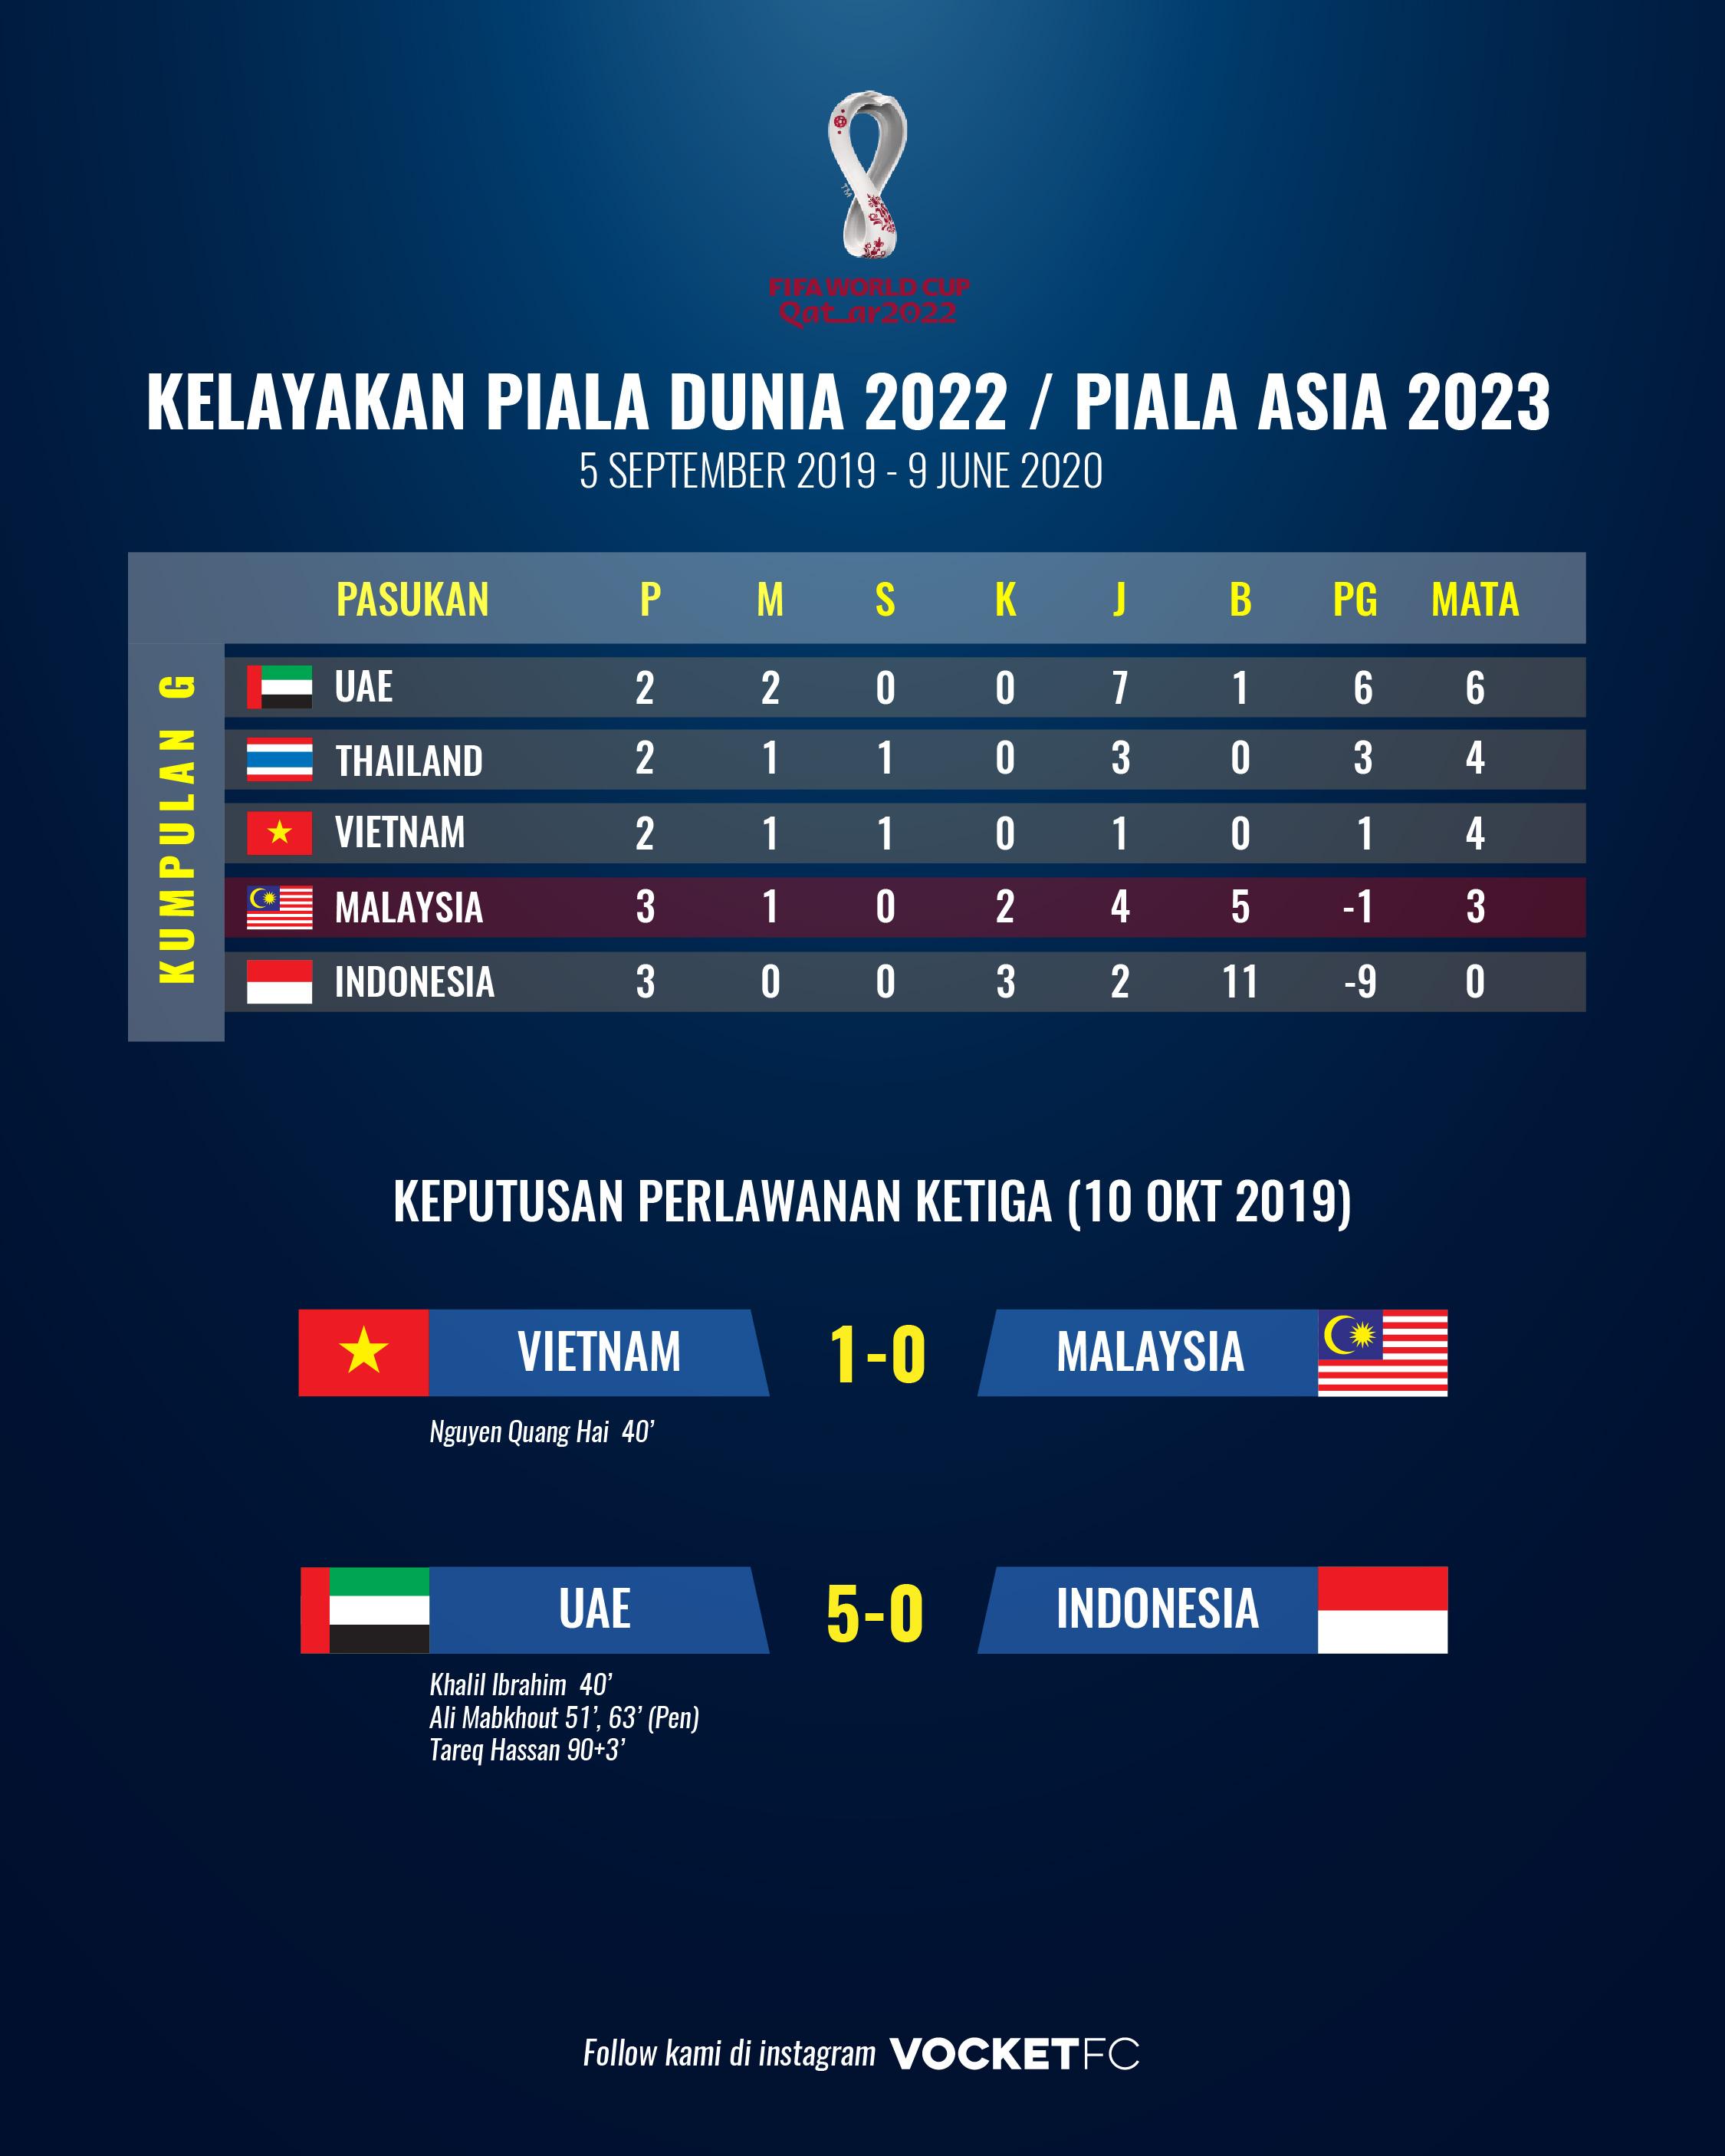 kelayakan piala dunia 2022-01